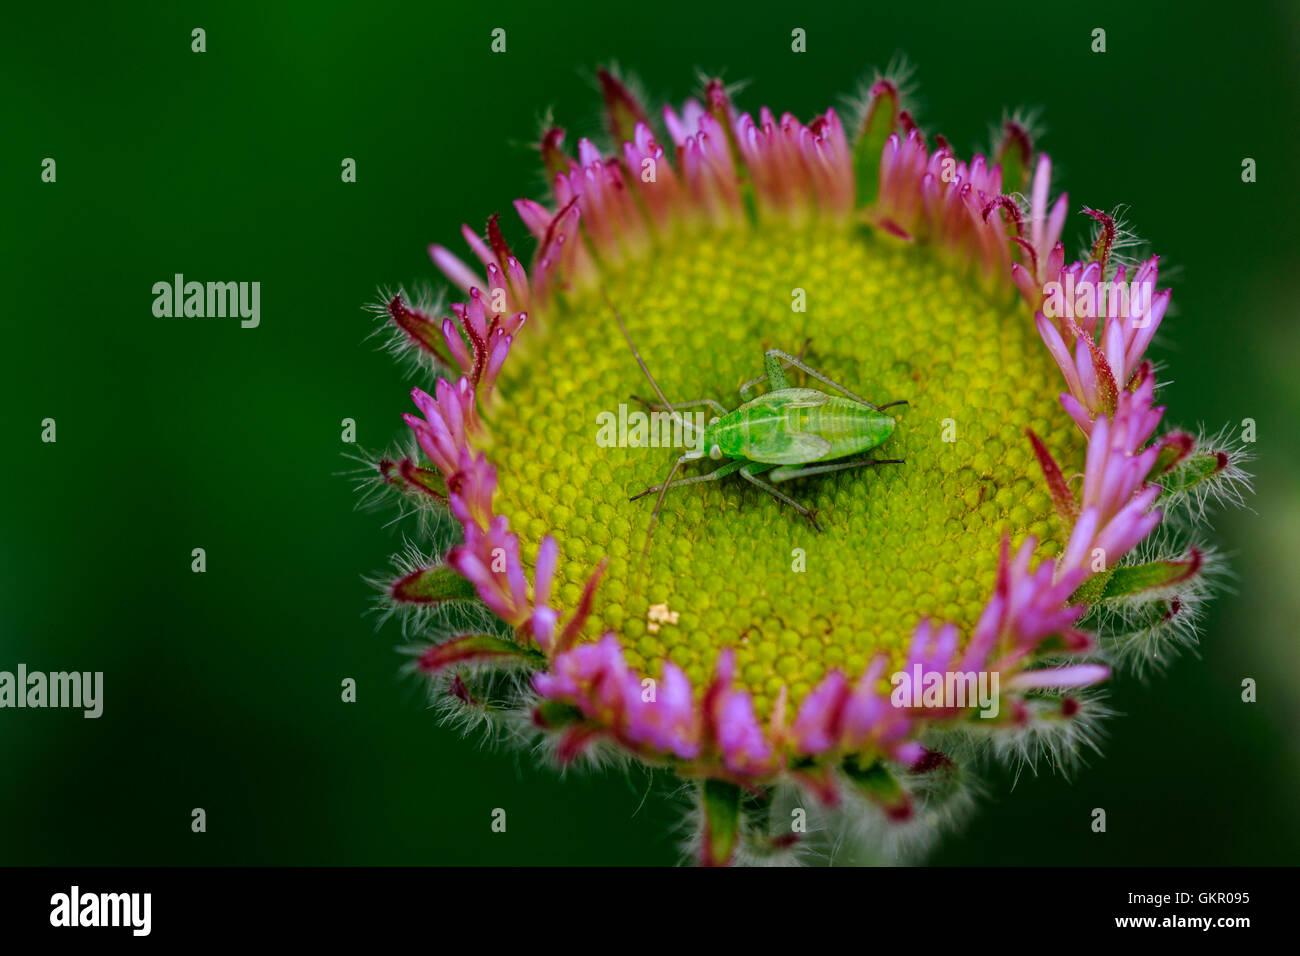 Mirid (Capsid) Bug Stenotus binotatus nymph on a Seaside Daisy flower - Stock Image